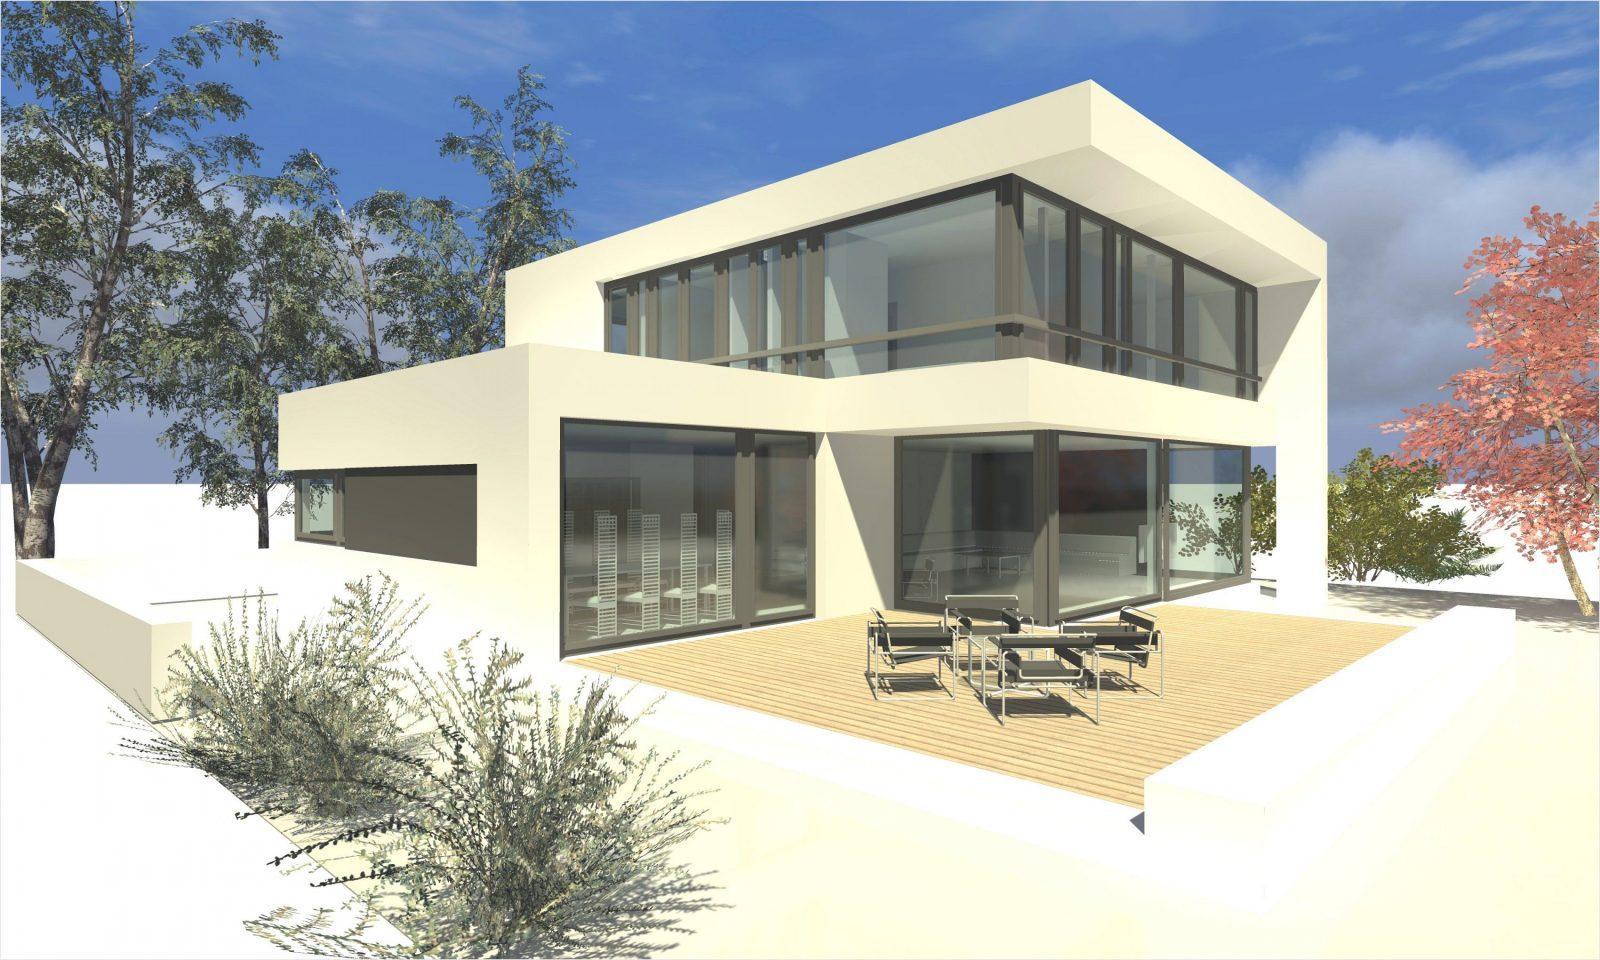 Elegantes Haus Bauen Ideen 18 Denvercleaningservices Haus Komplett Von Haus  Komplett Selber Bauen Bild